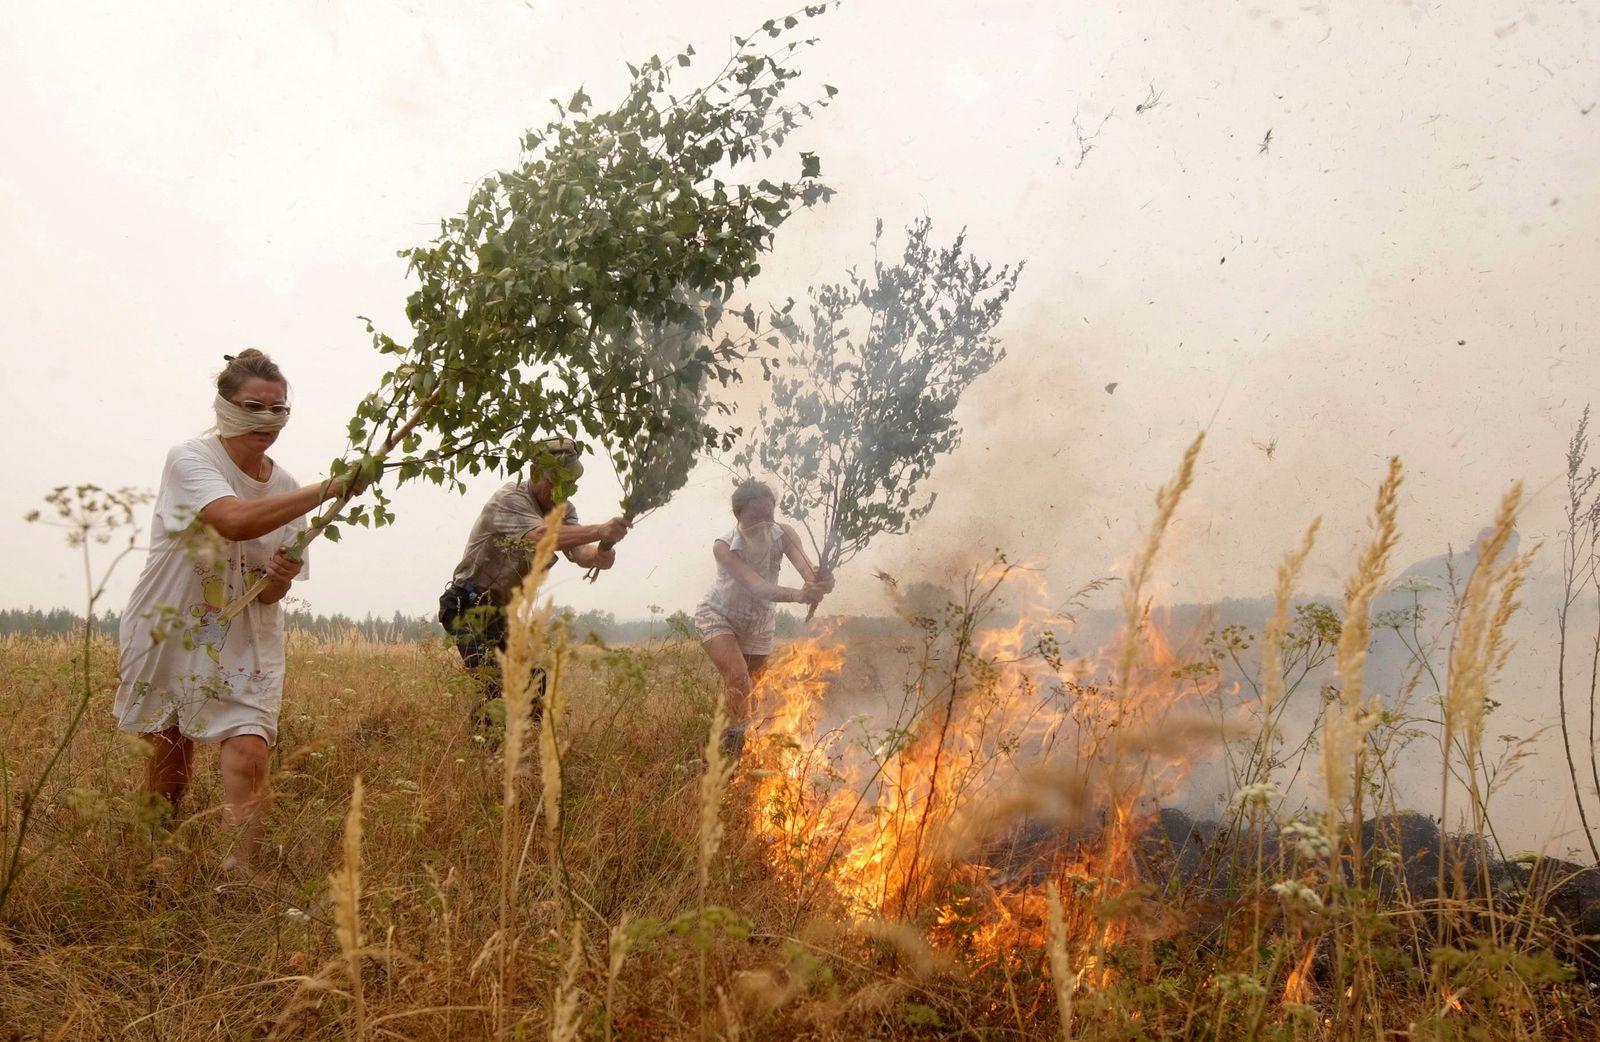 Brände in Russland / brennendes Feld / Feuer / Brand / Dürre